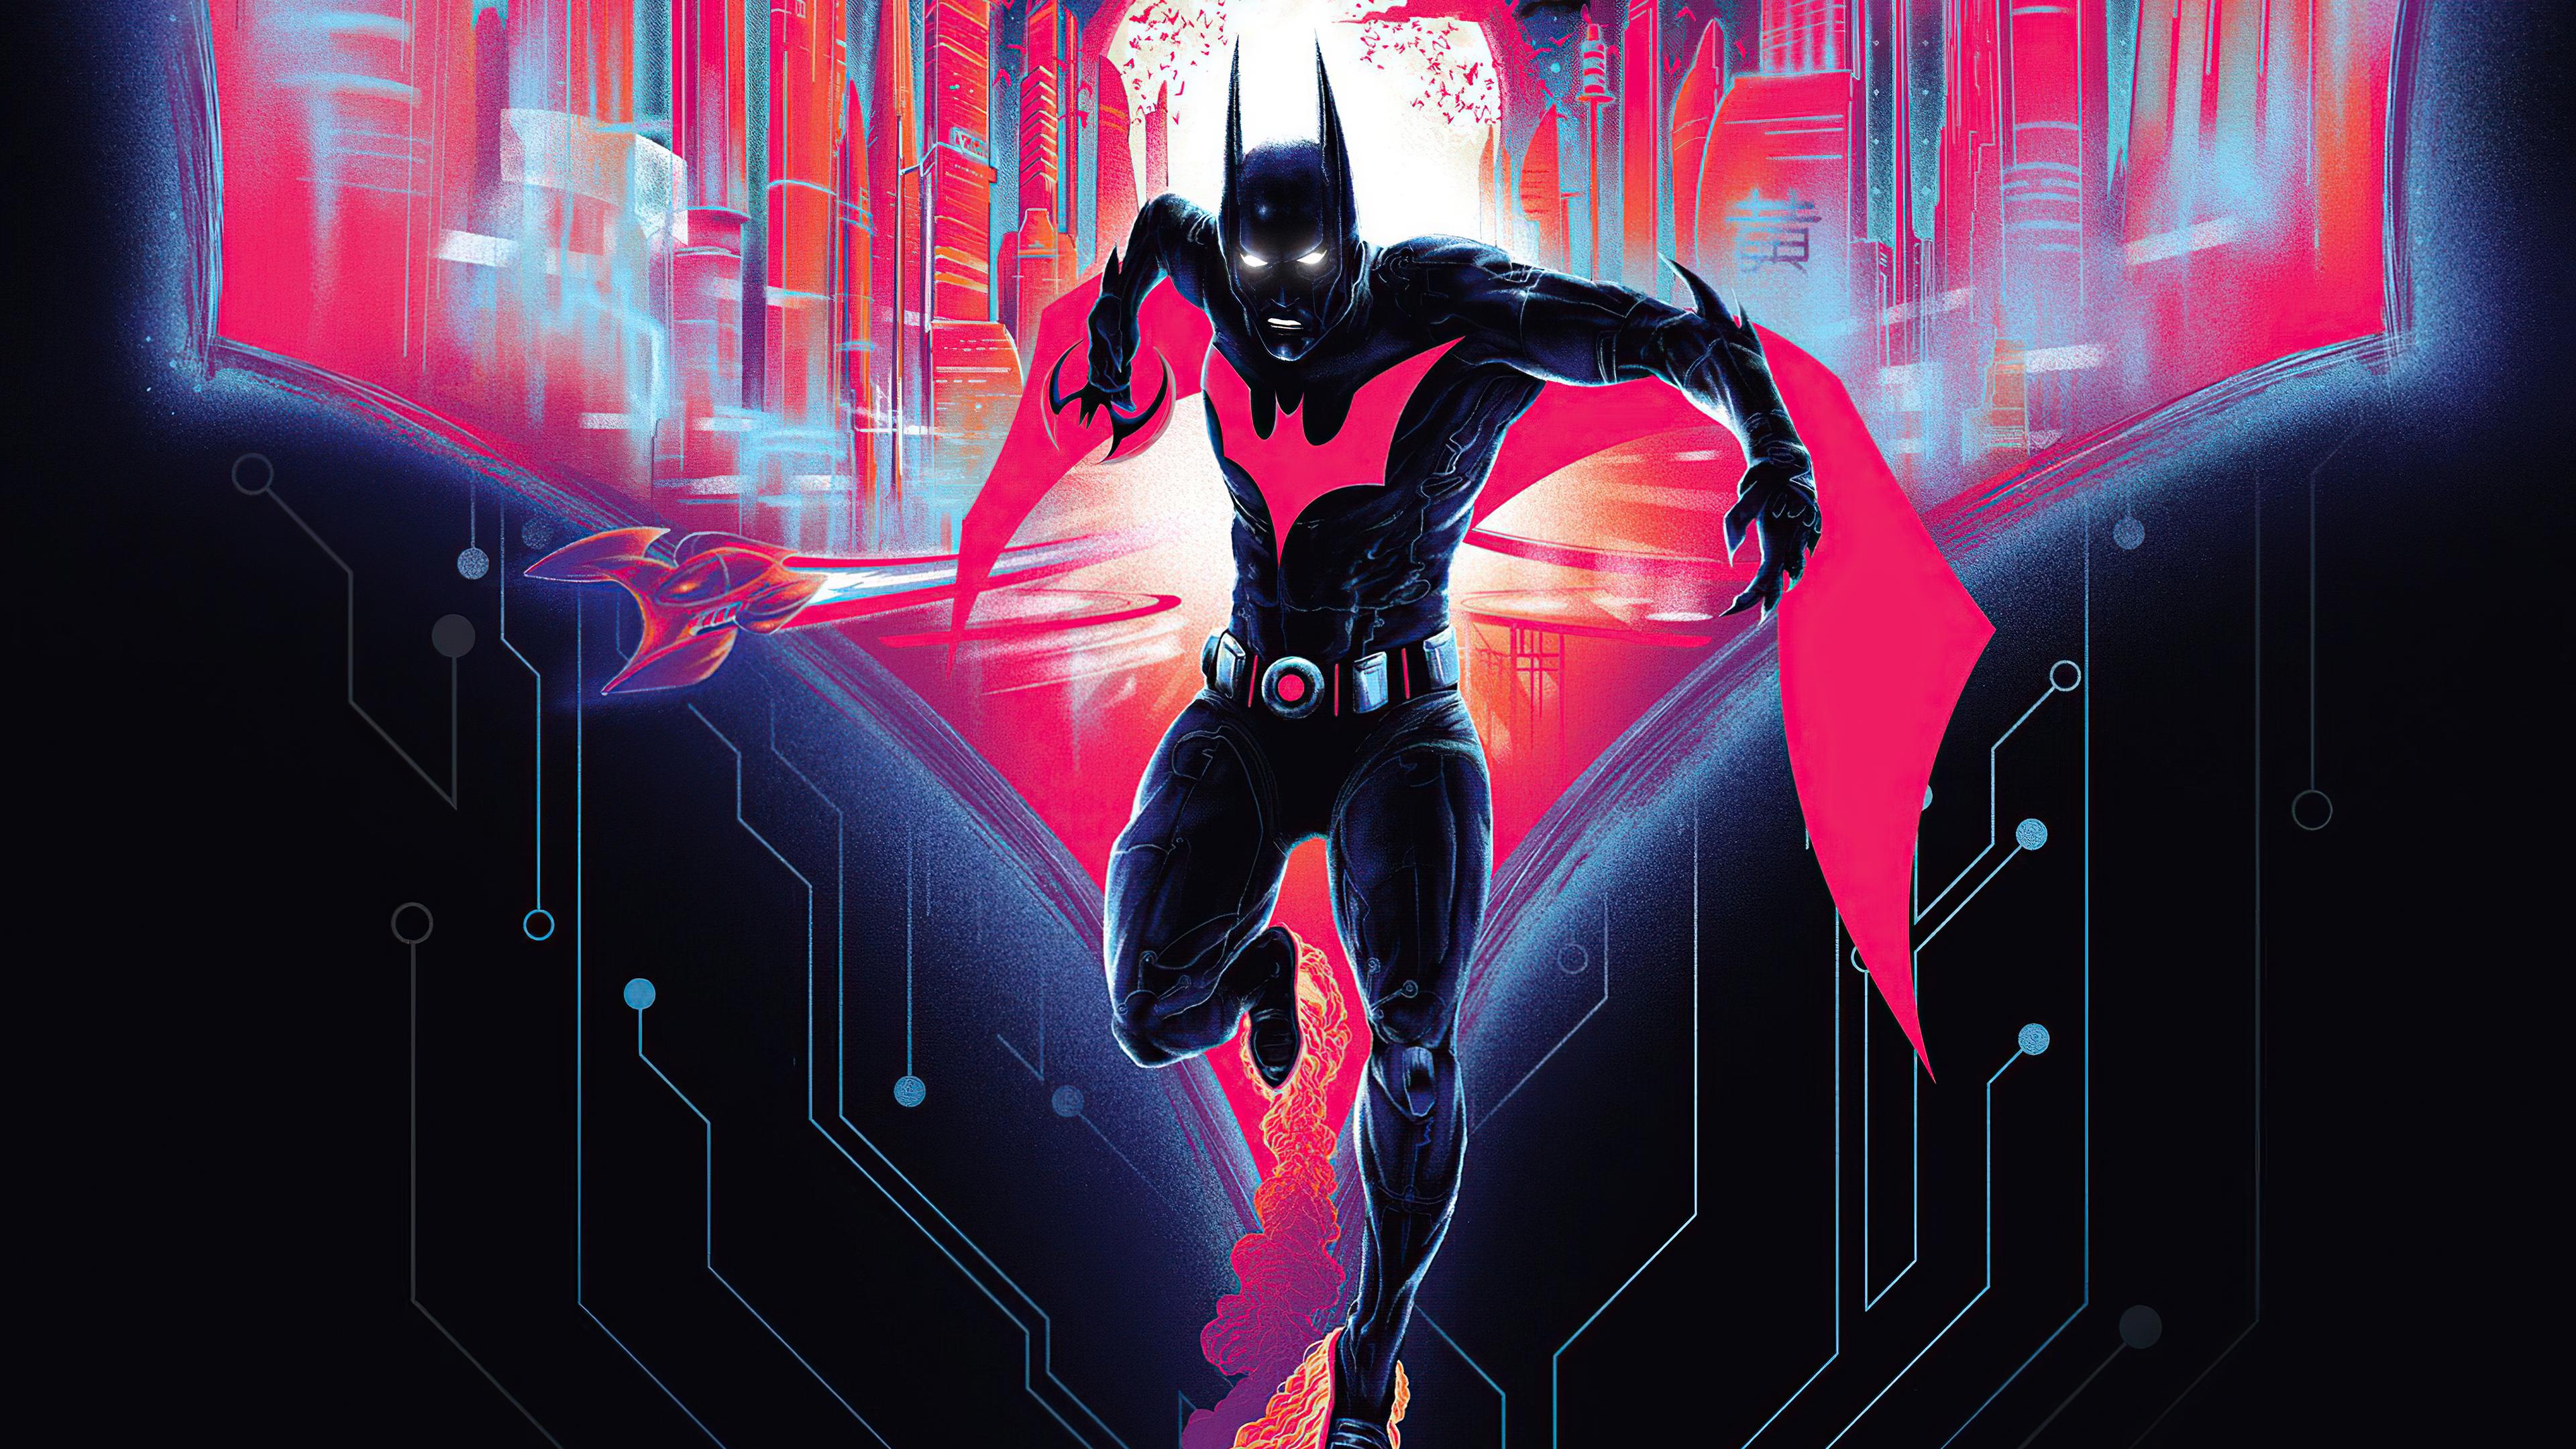 batman beyond 2021 4k 1616955524 - Batman Beyond 2021 4k - Batman Beyond 2021 4k wallpapers